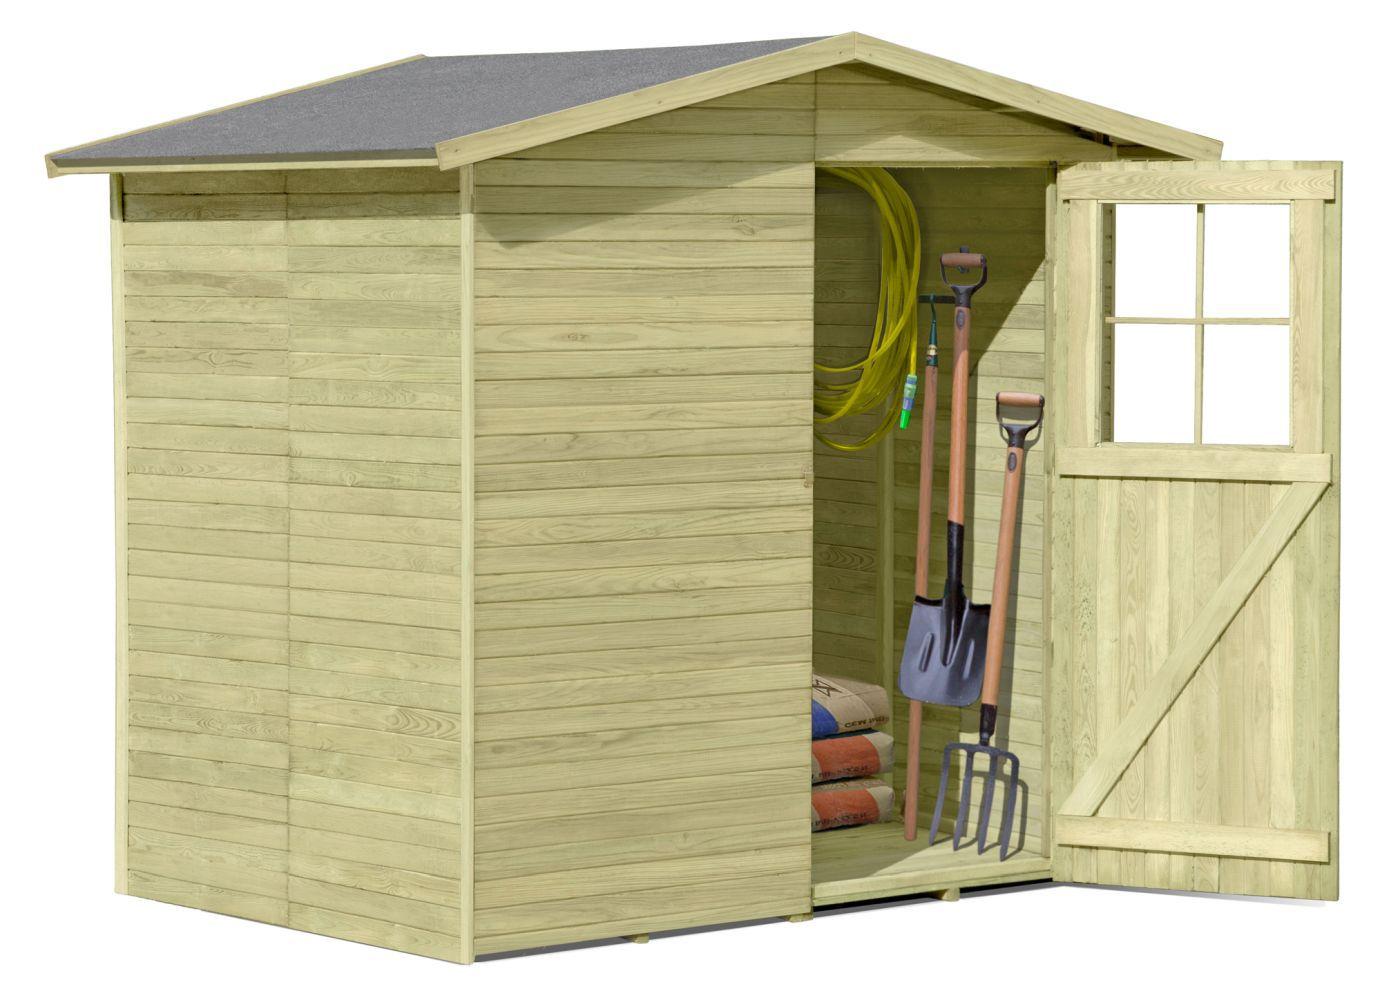 Gerätehaus 06, aus Kiefernholz, FSC® - Außenmaße: 200 x 200 x 210 cm (L x B x H)